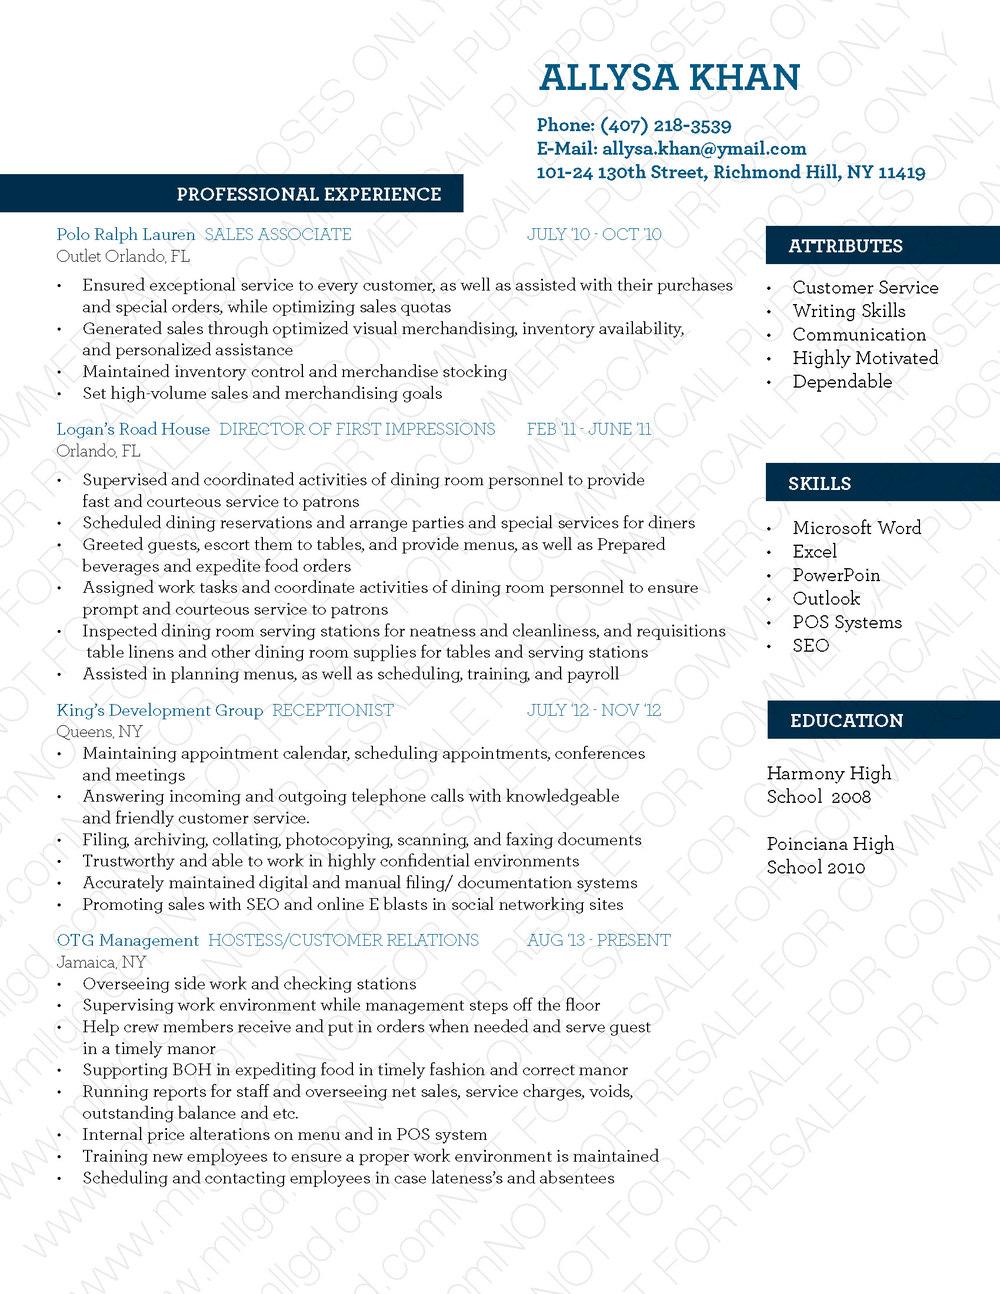 MLL_Resume_Design_2014_Page_12.jpg